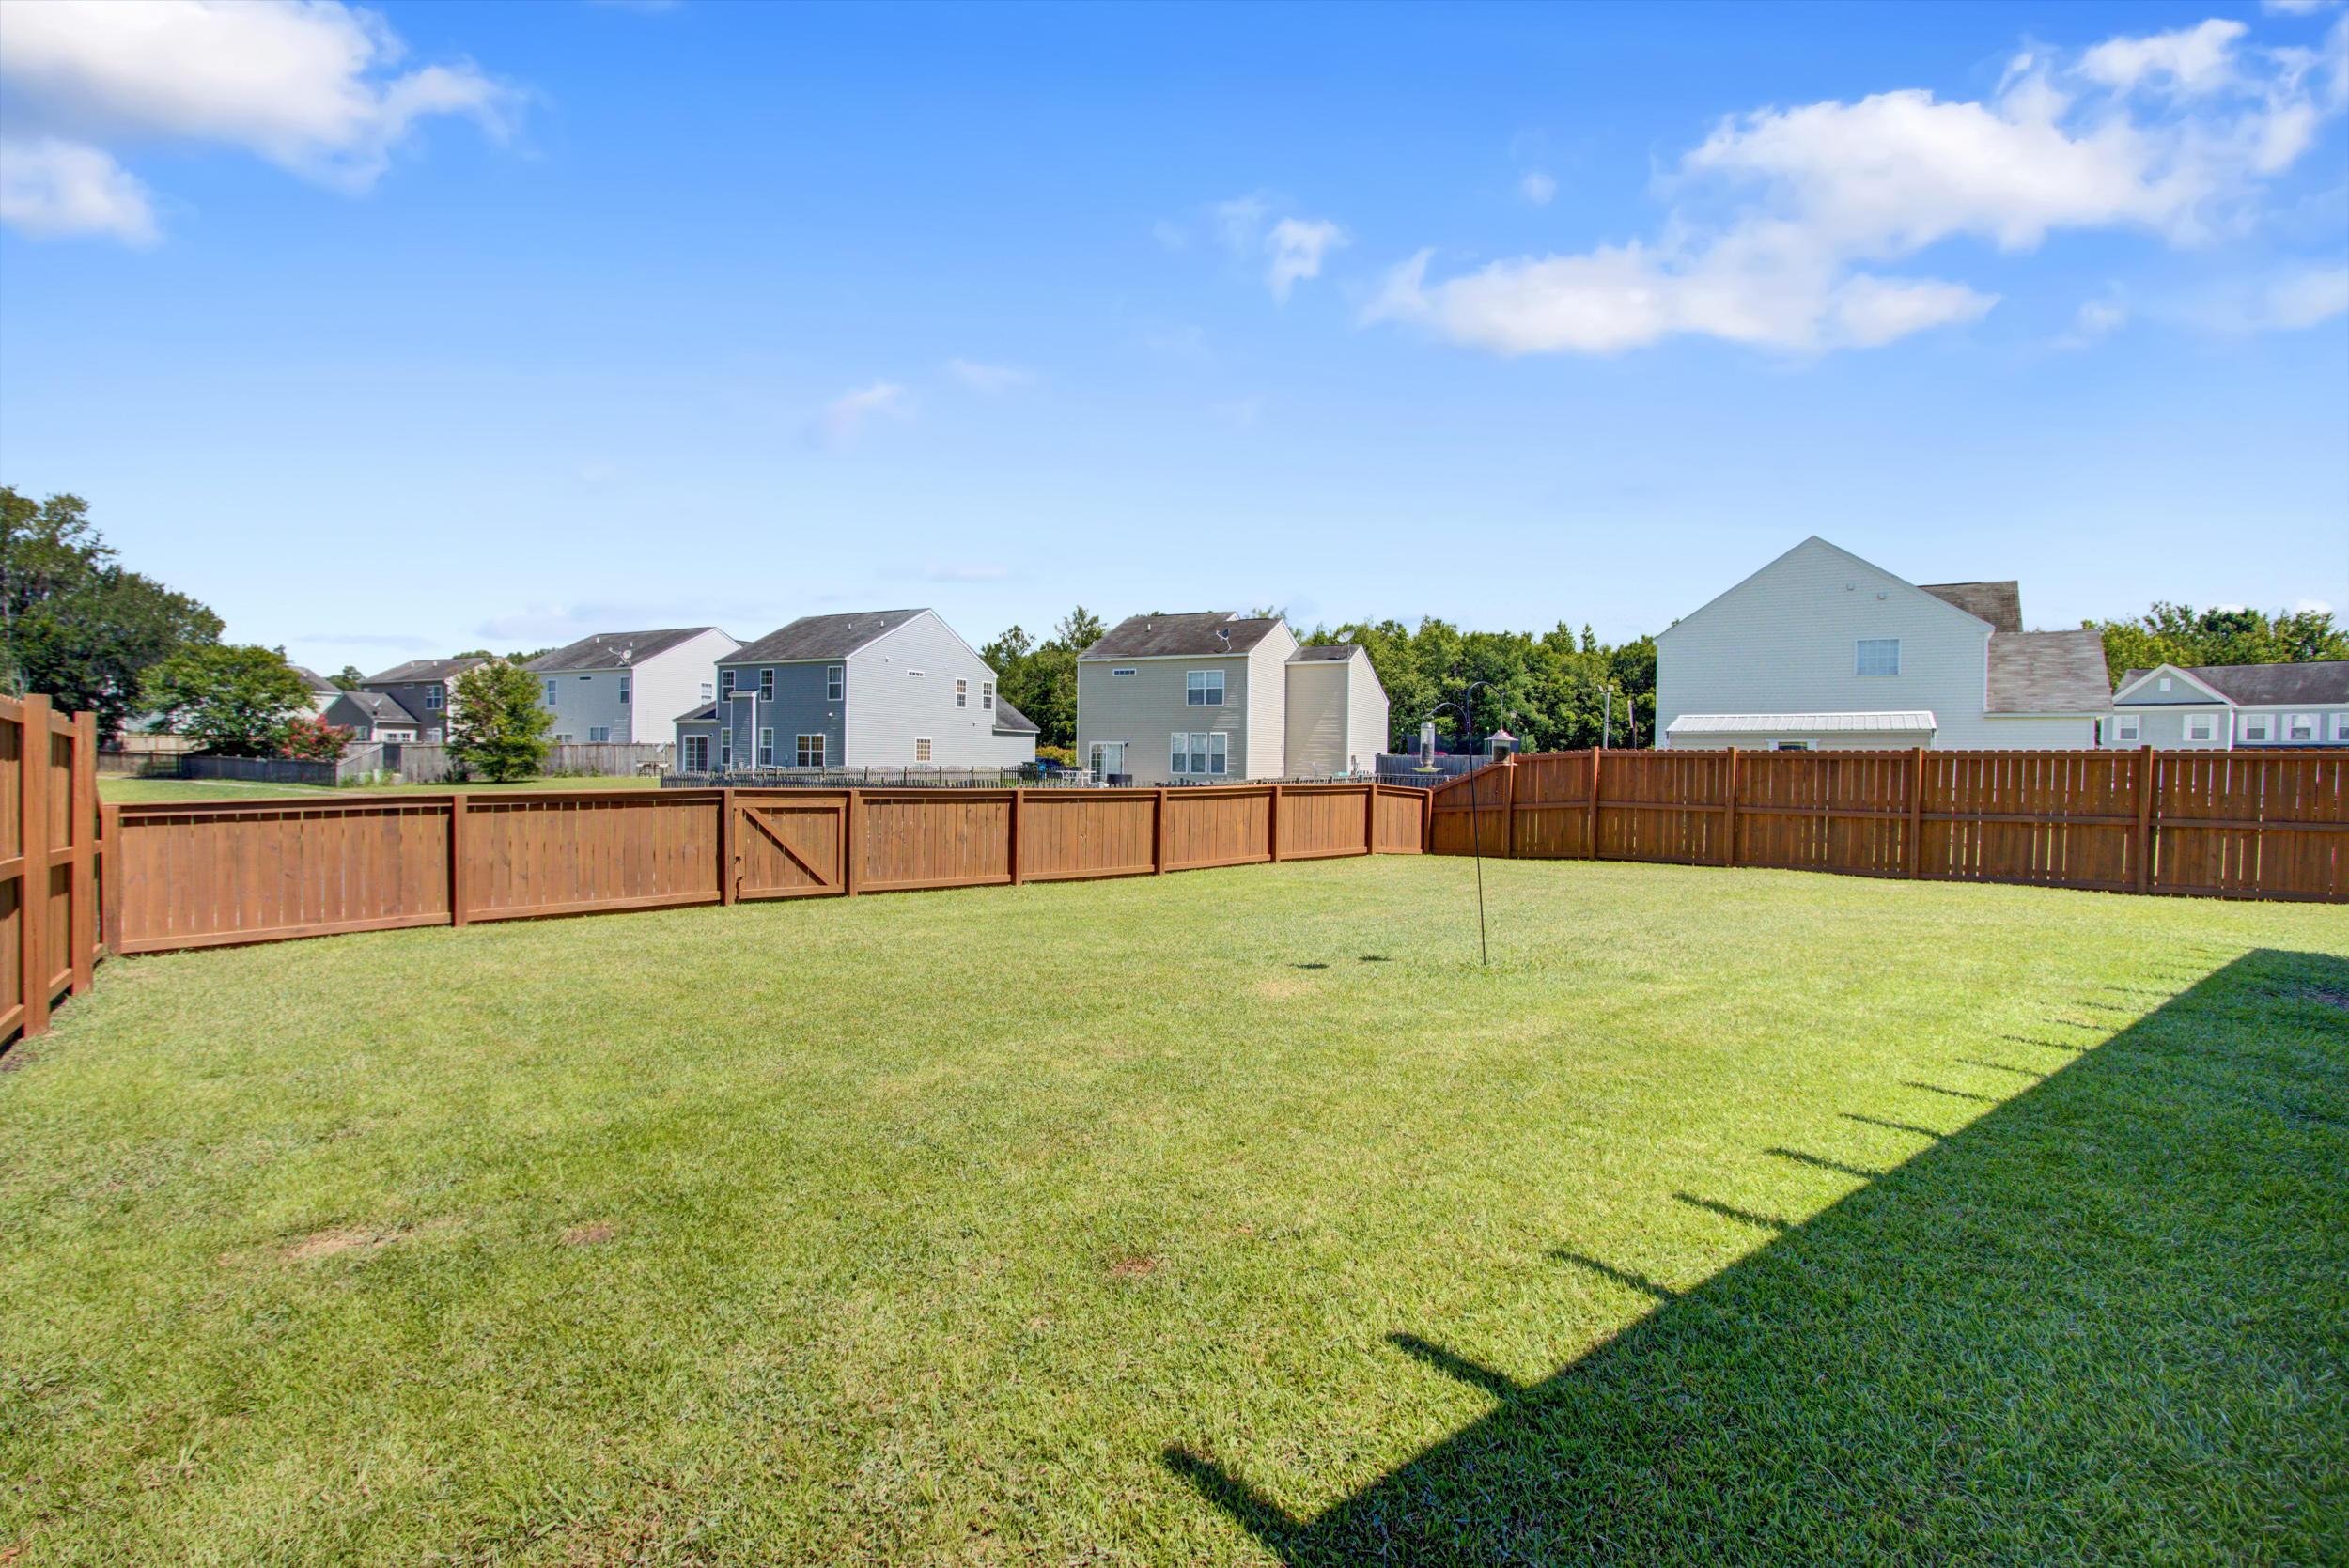 Oakley Pointe Homes For Sale - 576 English Oak, Moncks Corner, SC - 29